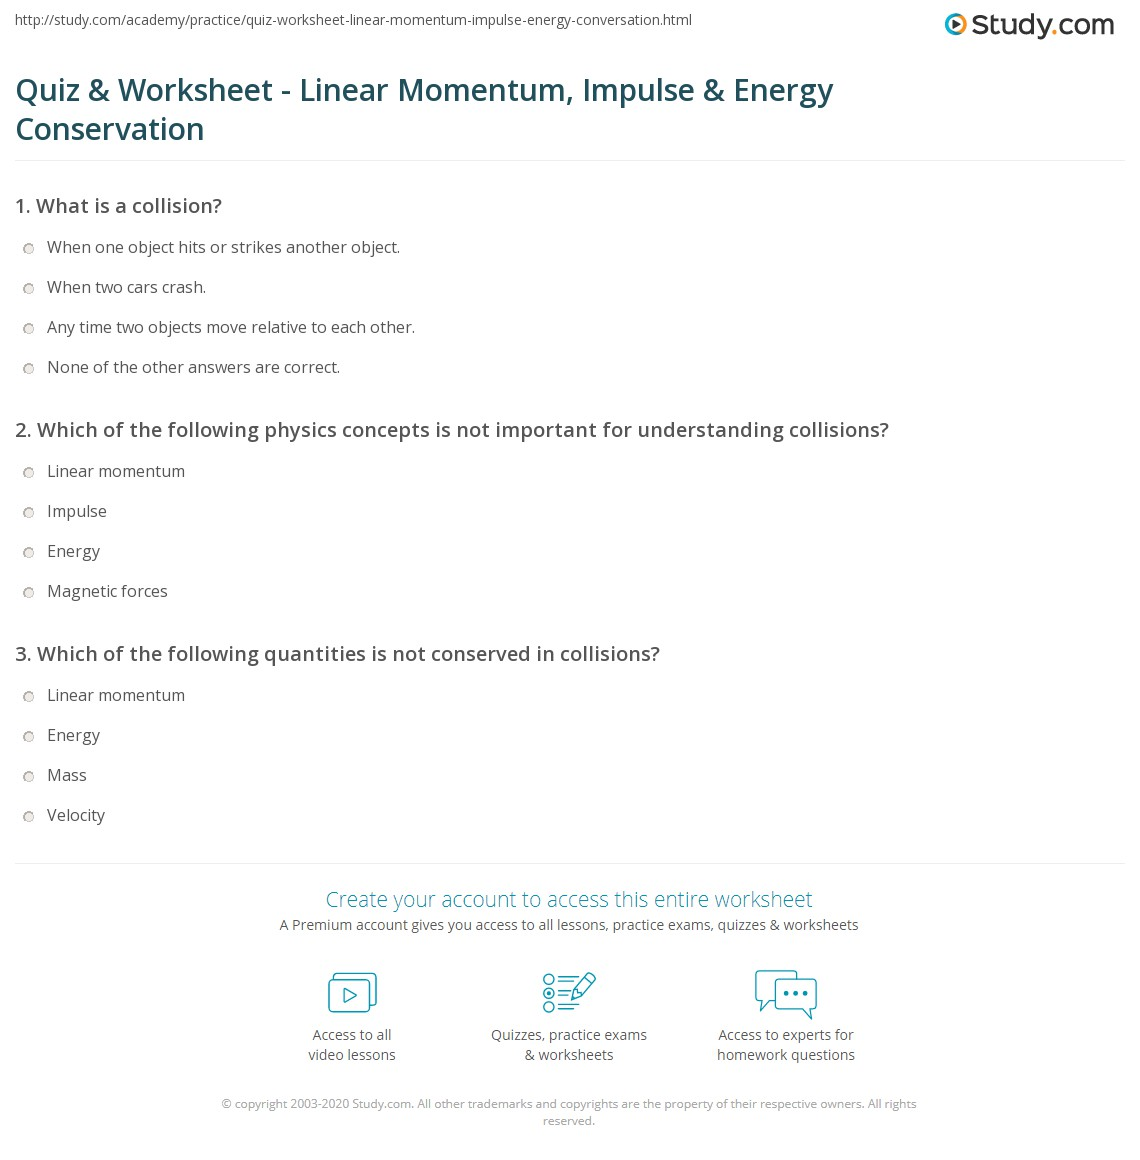 Quiz & Worksheet - Linear Momentum, Impulse & Energy Conservation ...